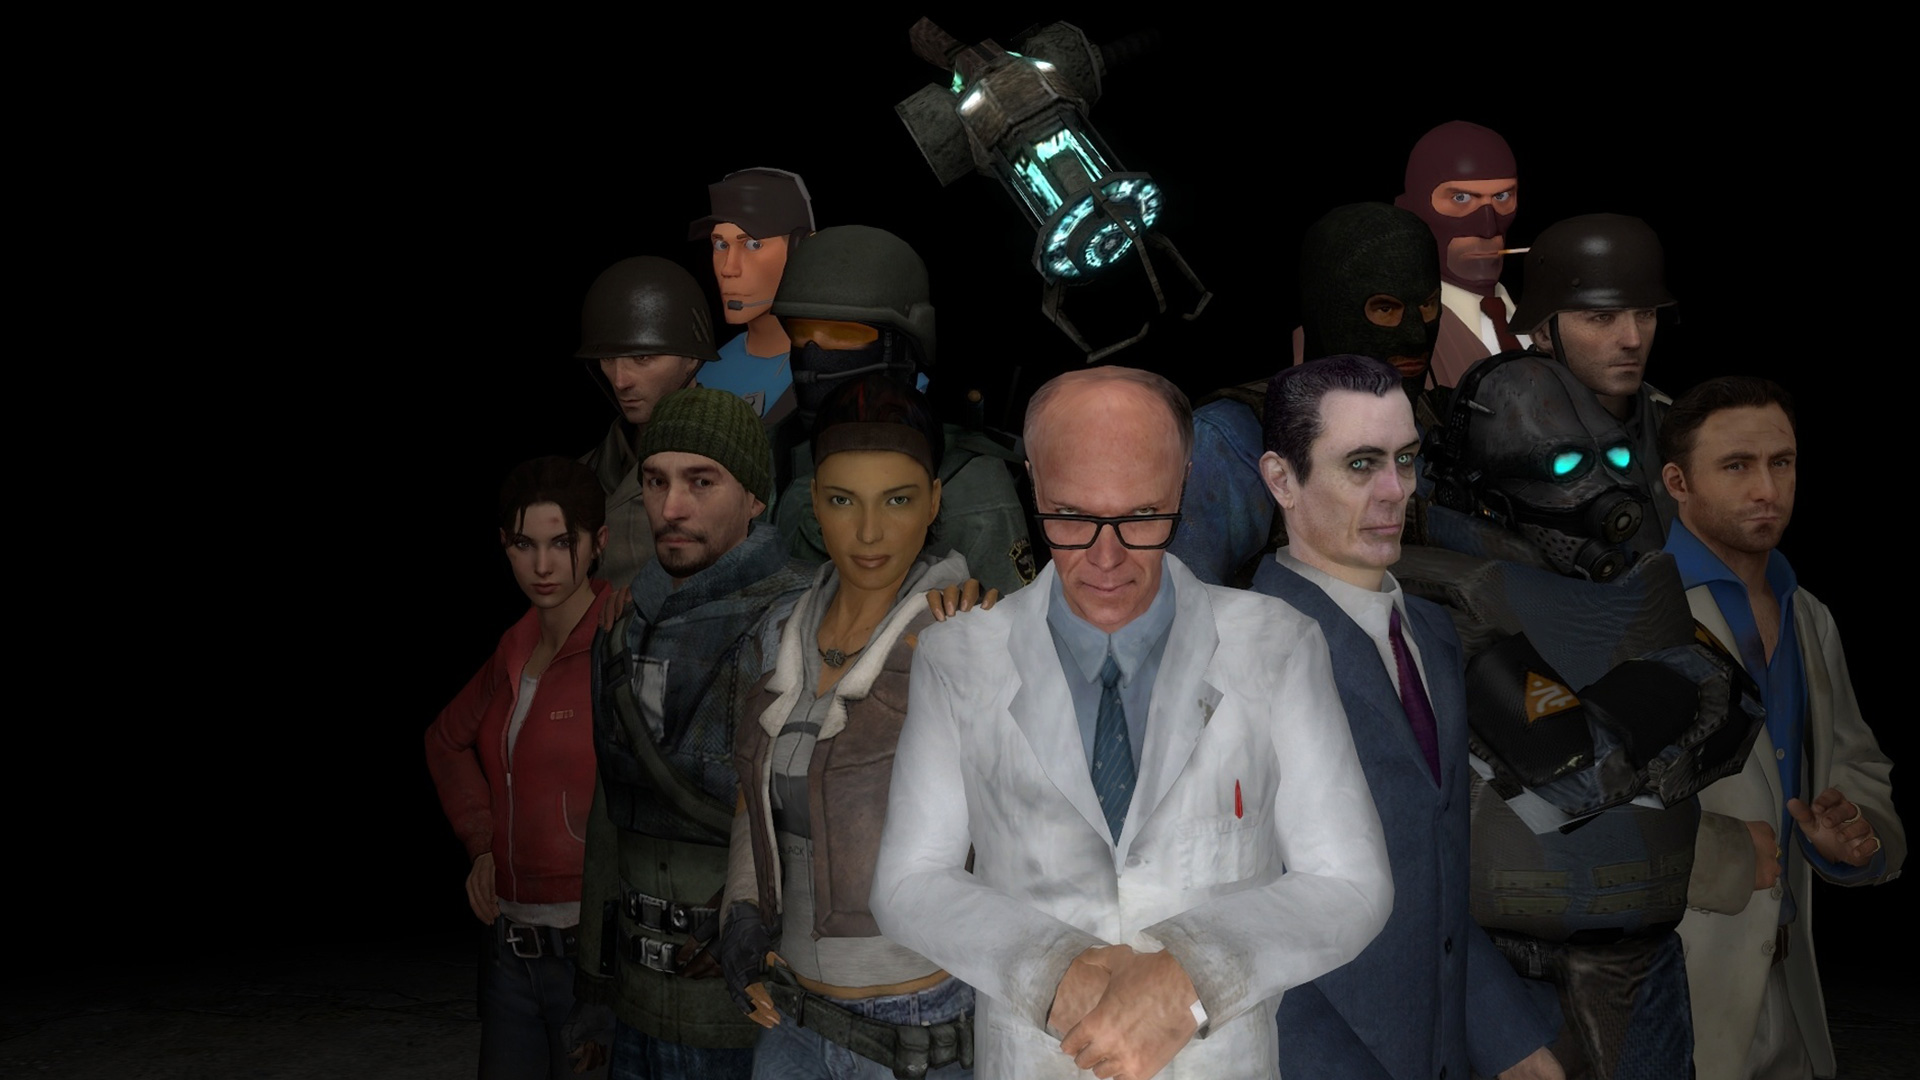 Free Half-Life 2 - Garry's Mod Wallpaper in 1920x1080